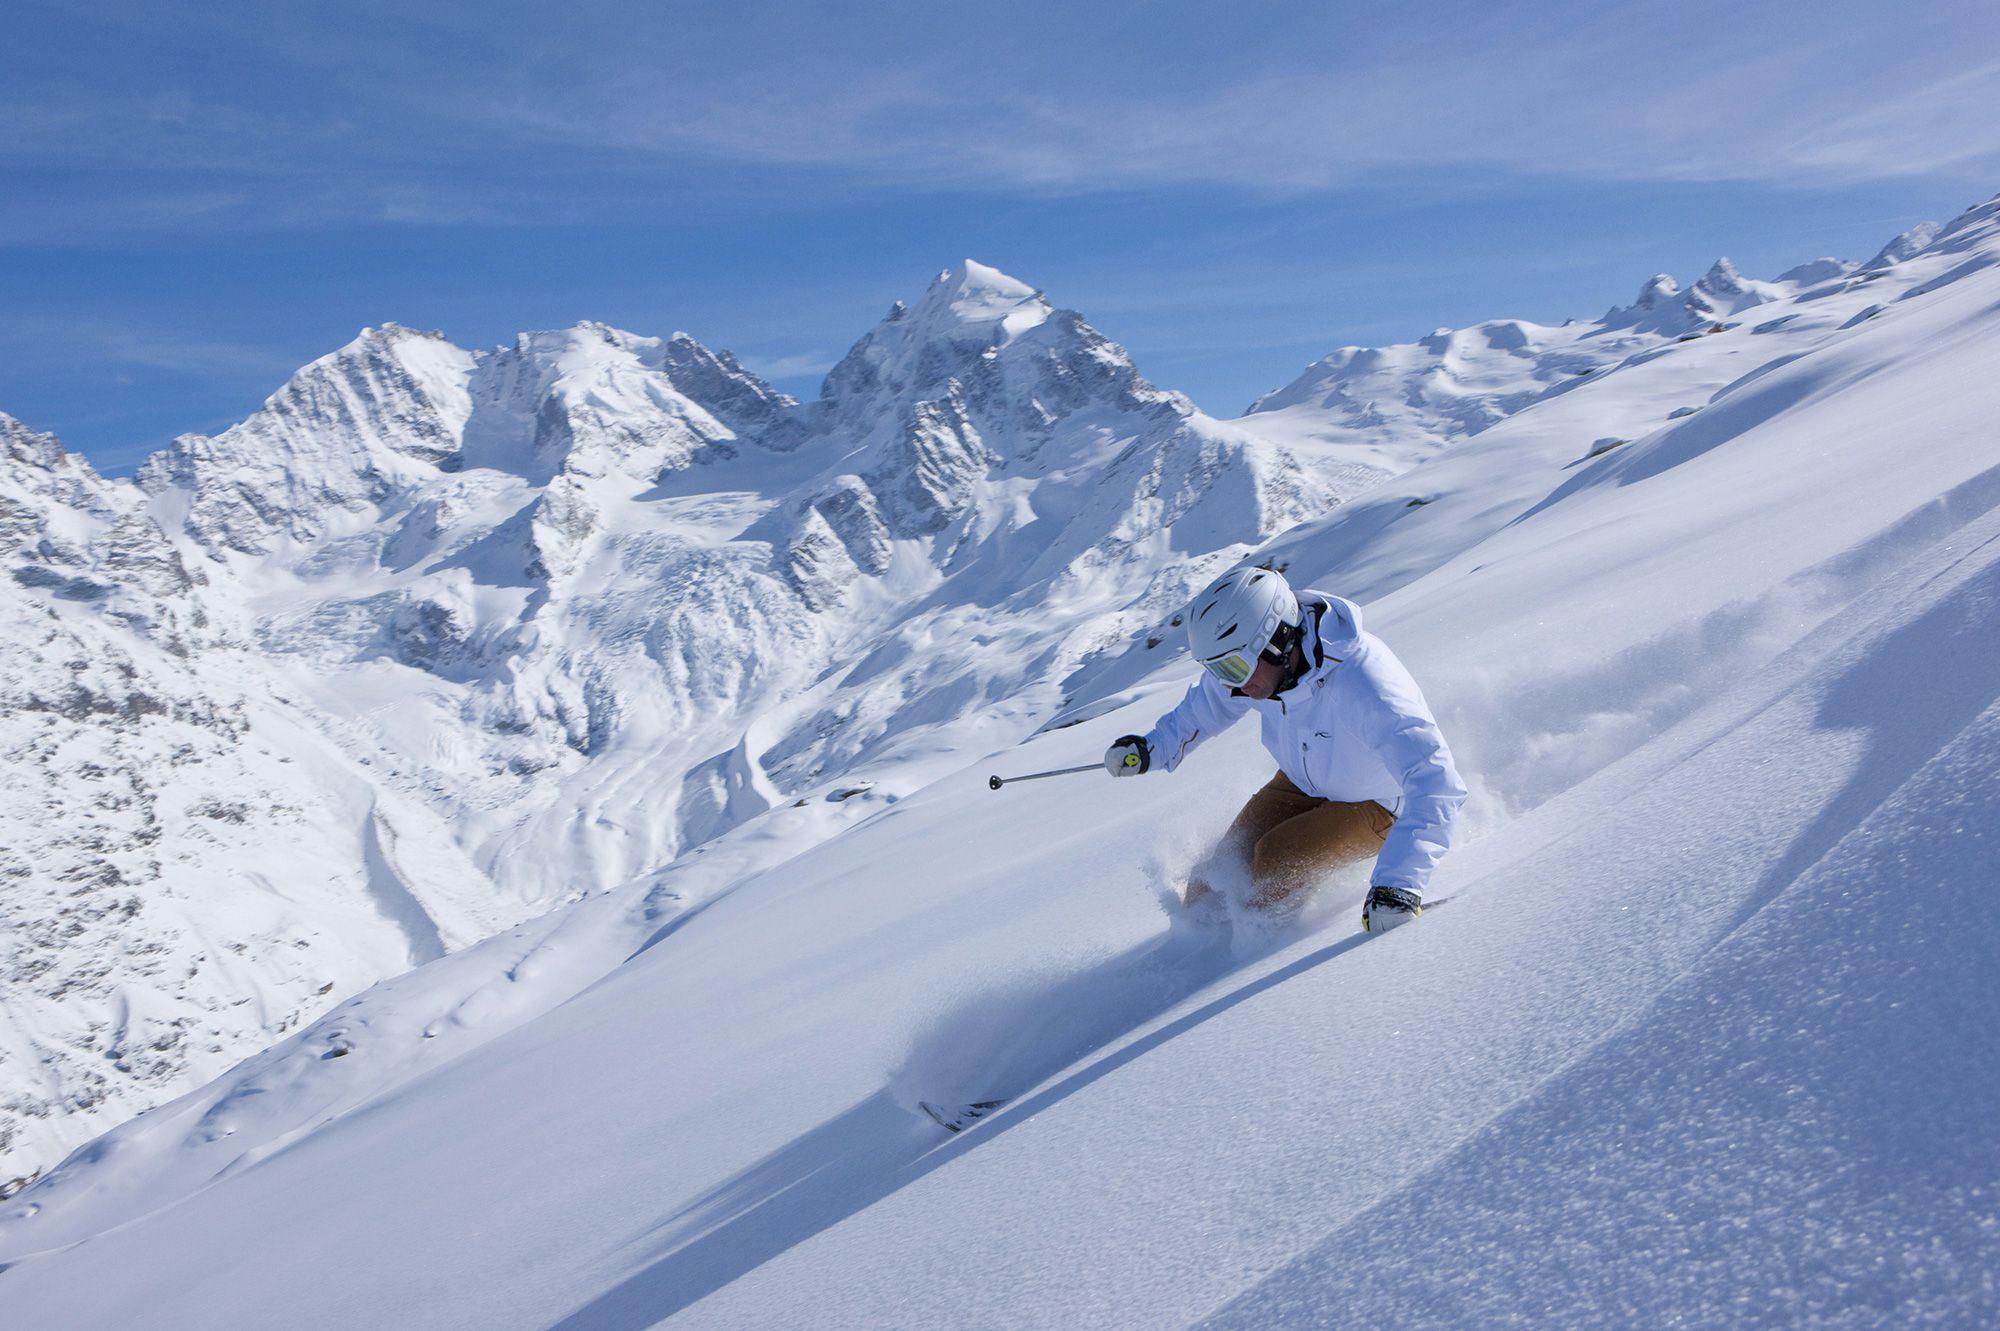 Schweizerhof St. Moritz Winter